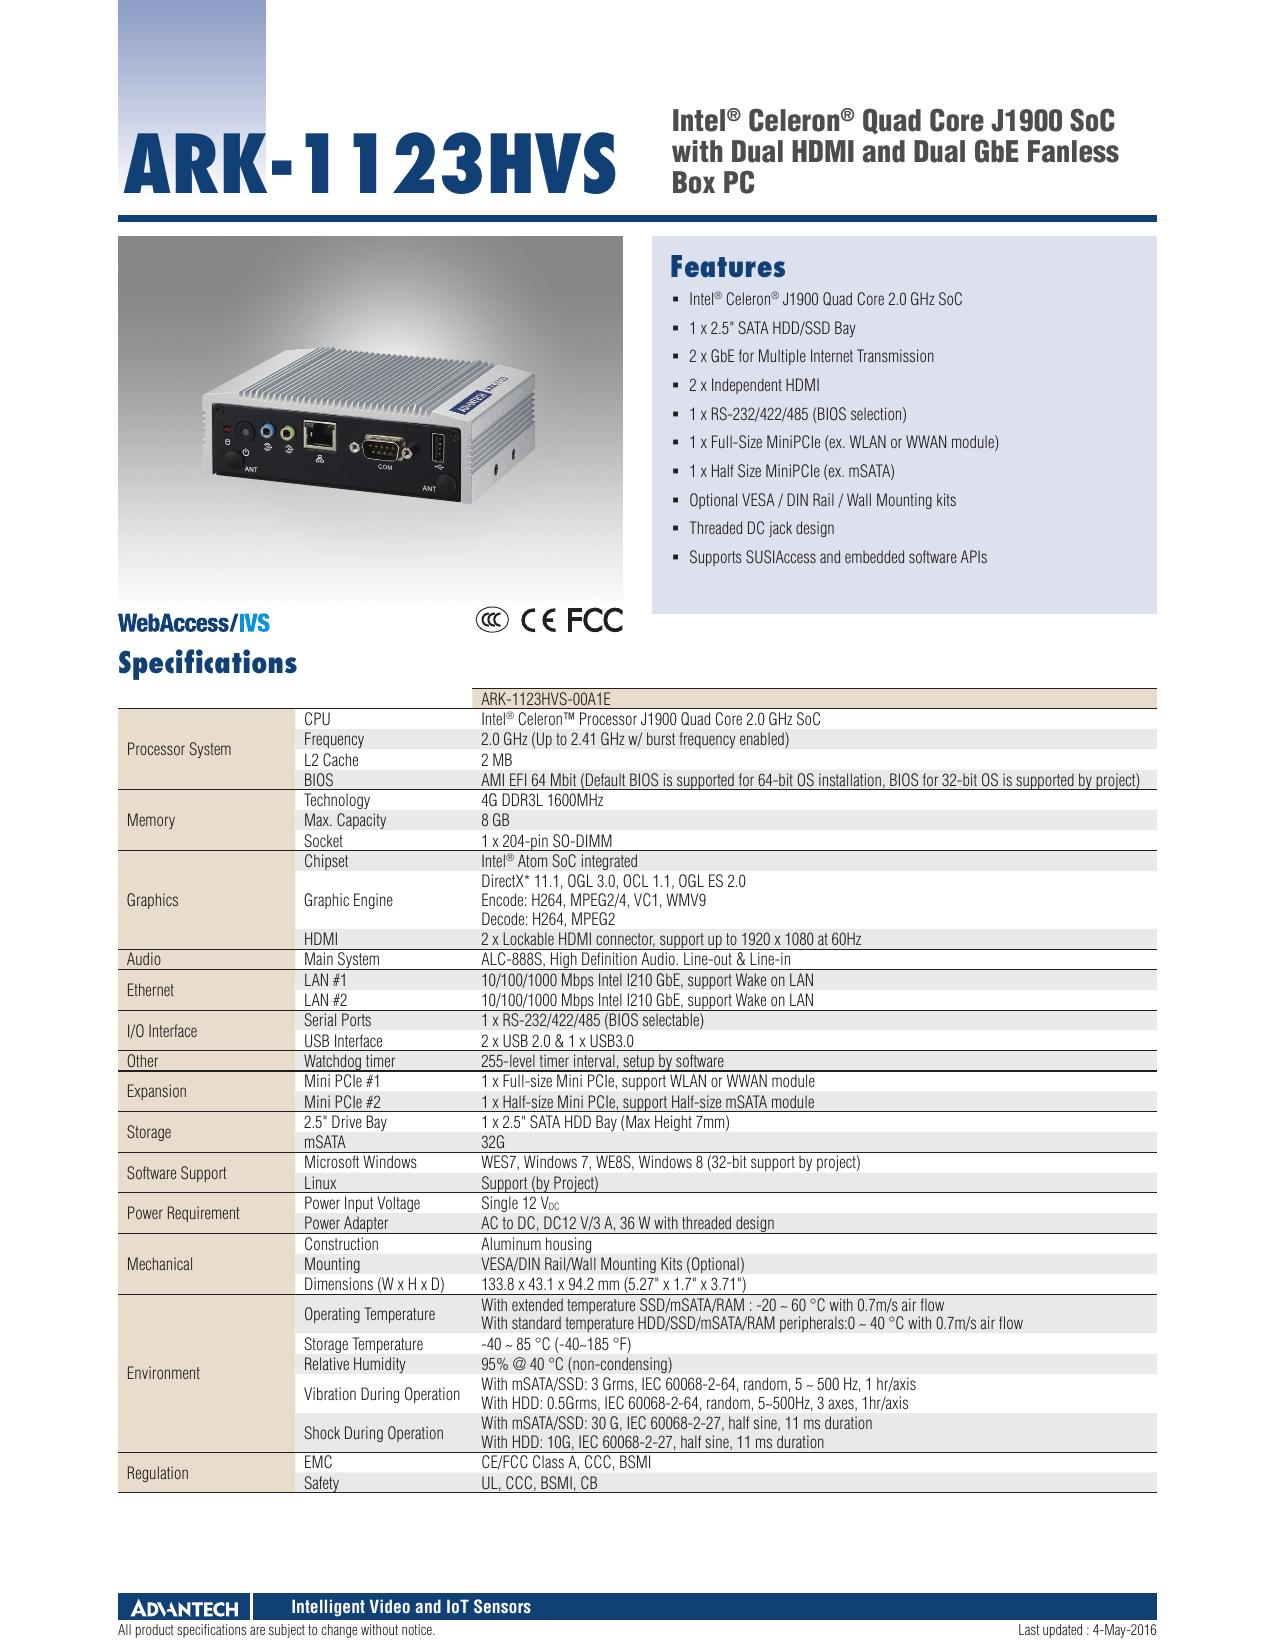 ARK-1123HVS | manualzz com